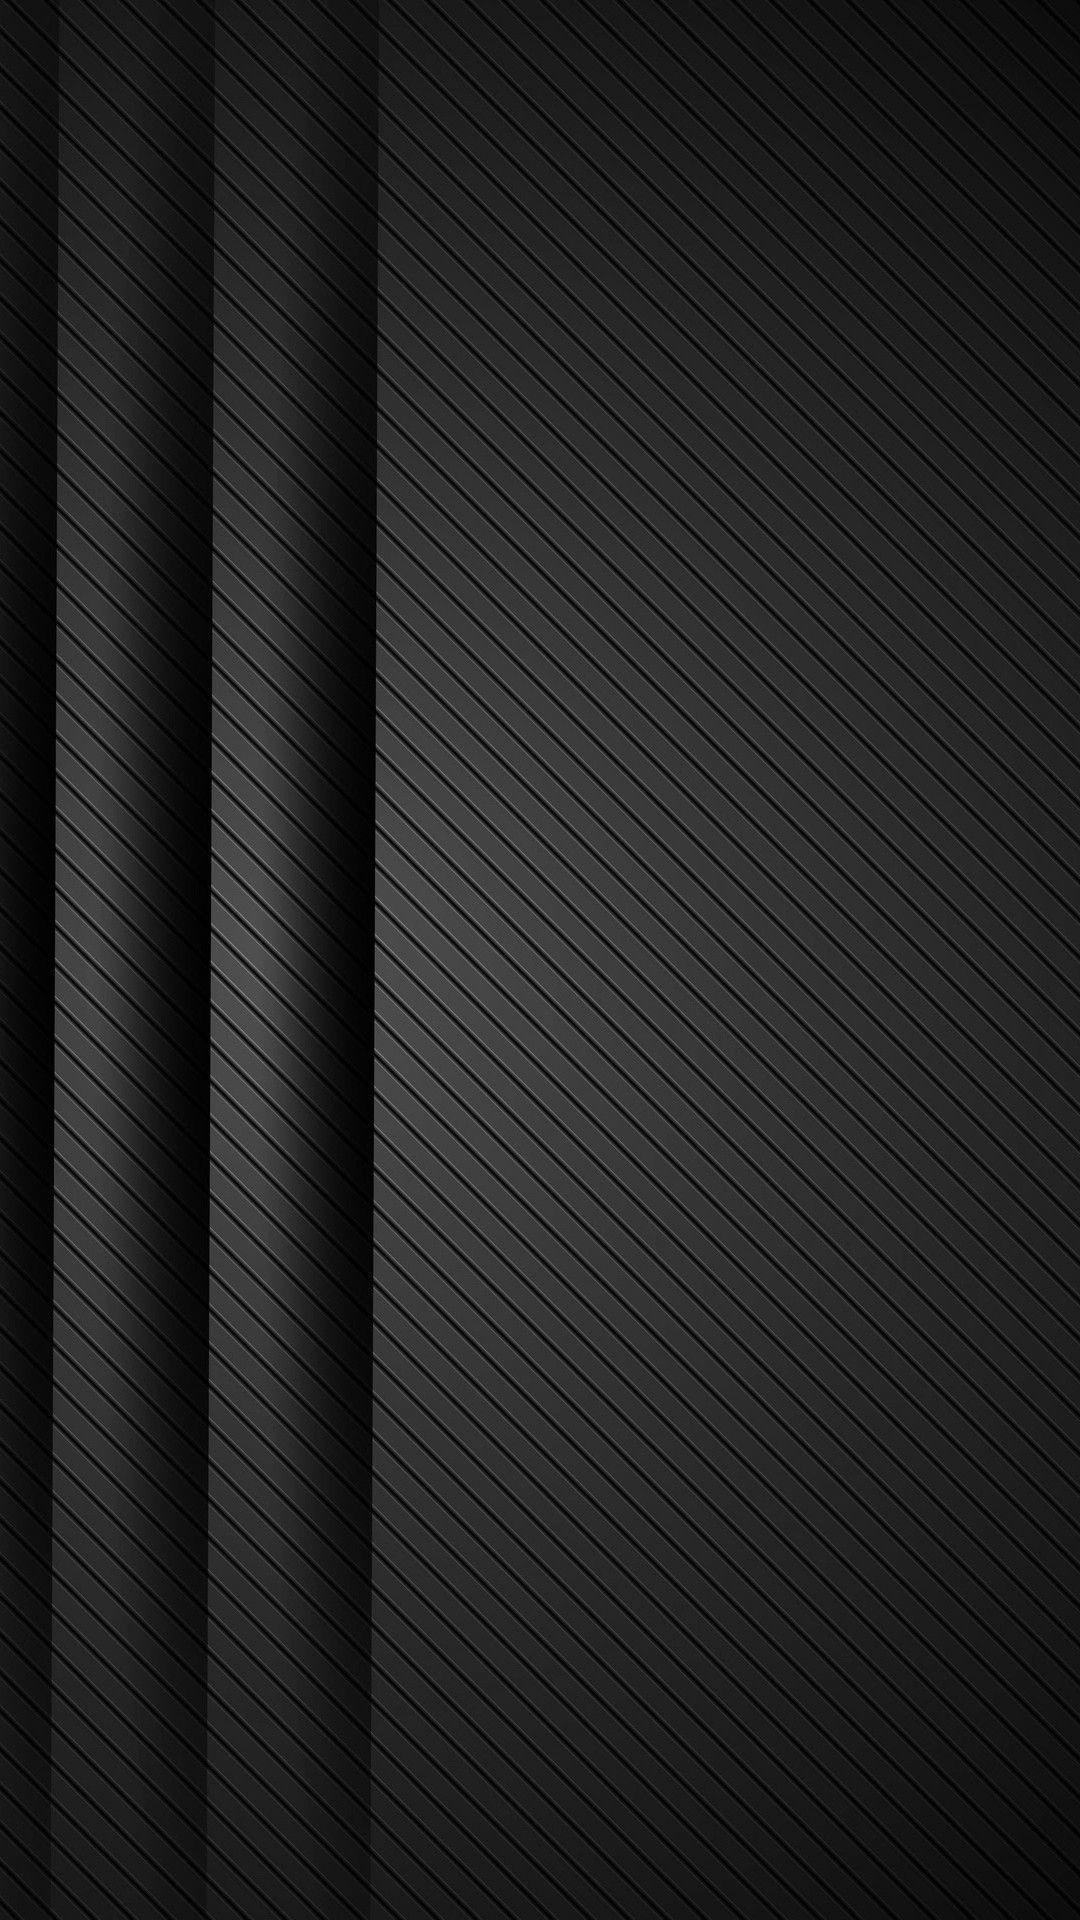 New Iphone Wallpaper Iphone Wallpaper Black Wallpaper Iphone Dark Wallpaper Iphone Wallpaper Edge